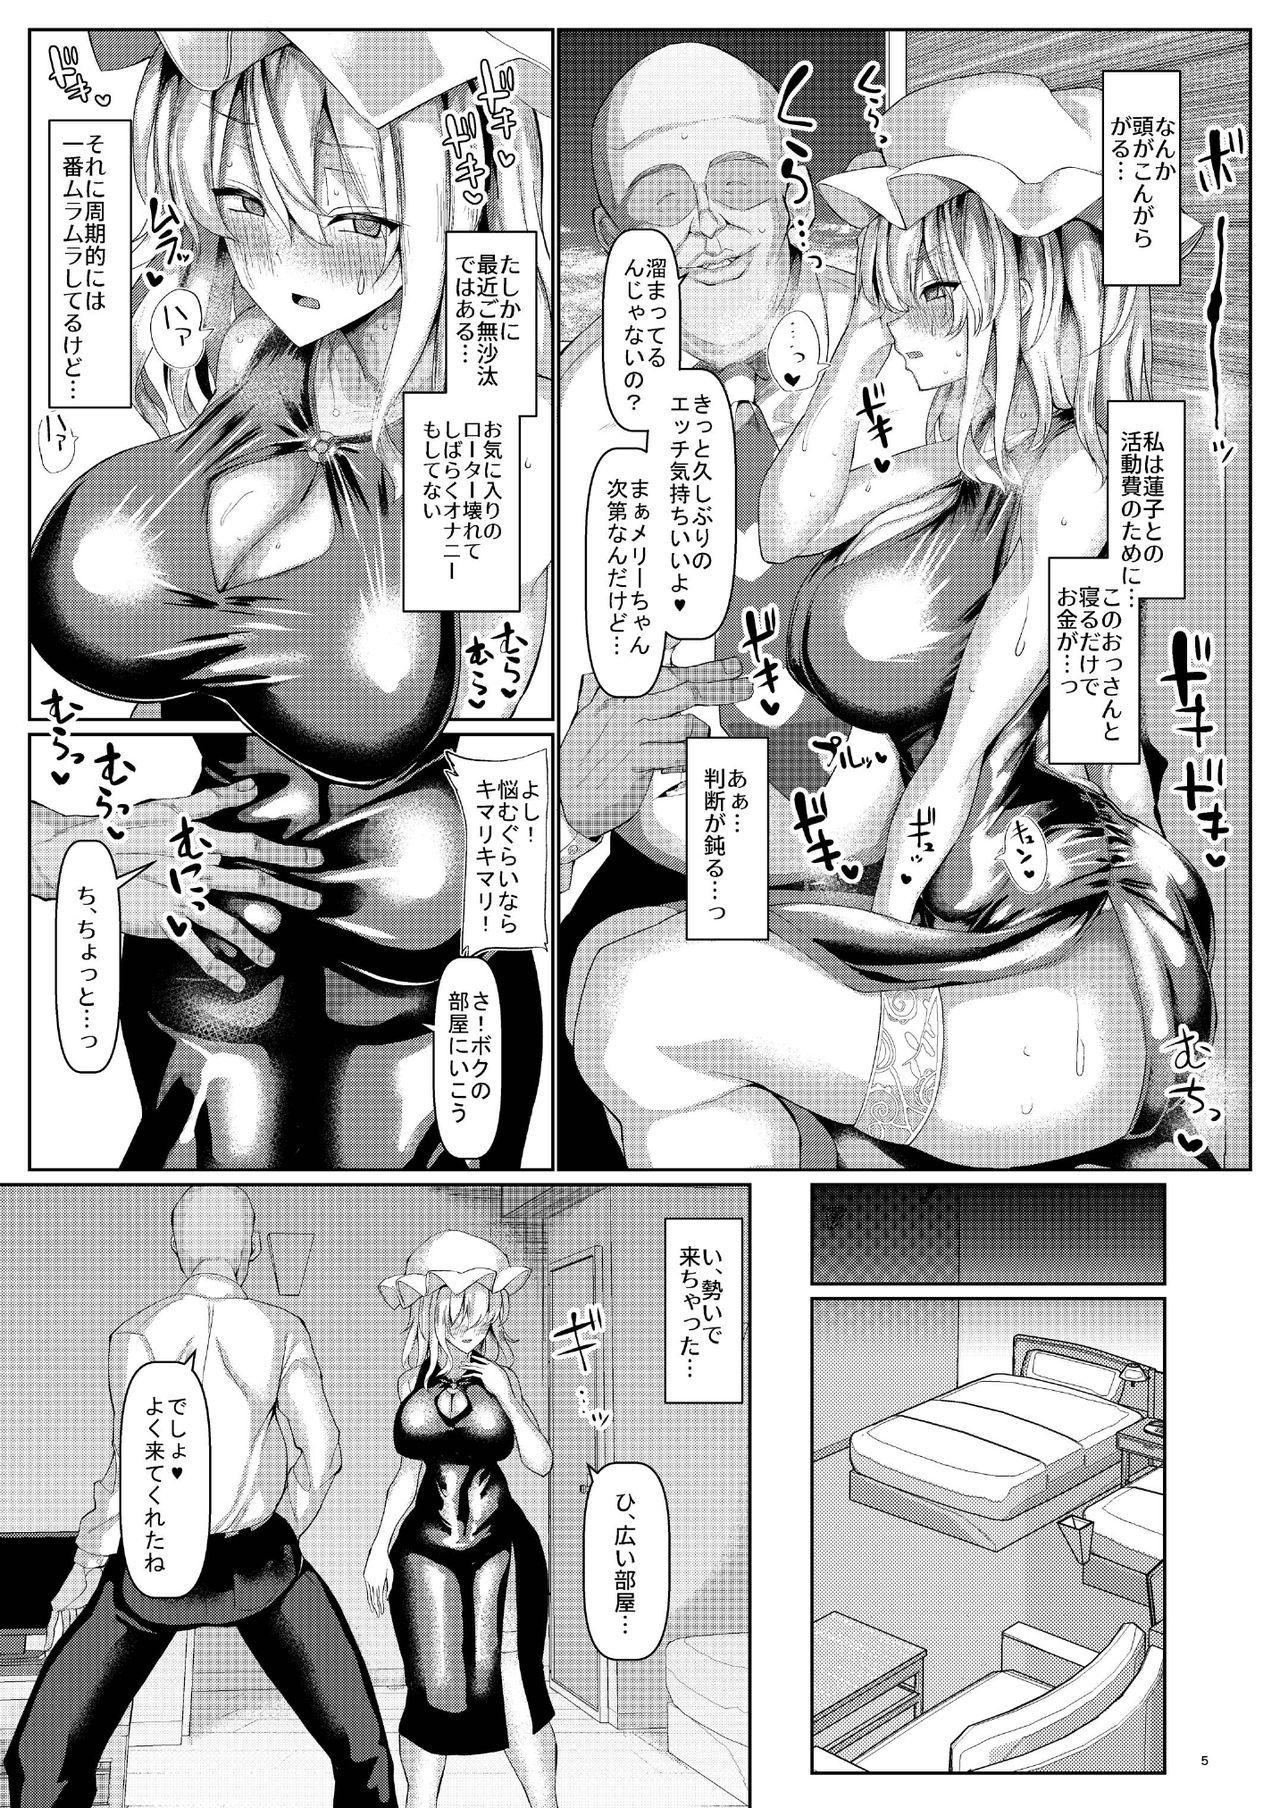 BodyCon Merry no Ogehin Koubi 6